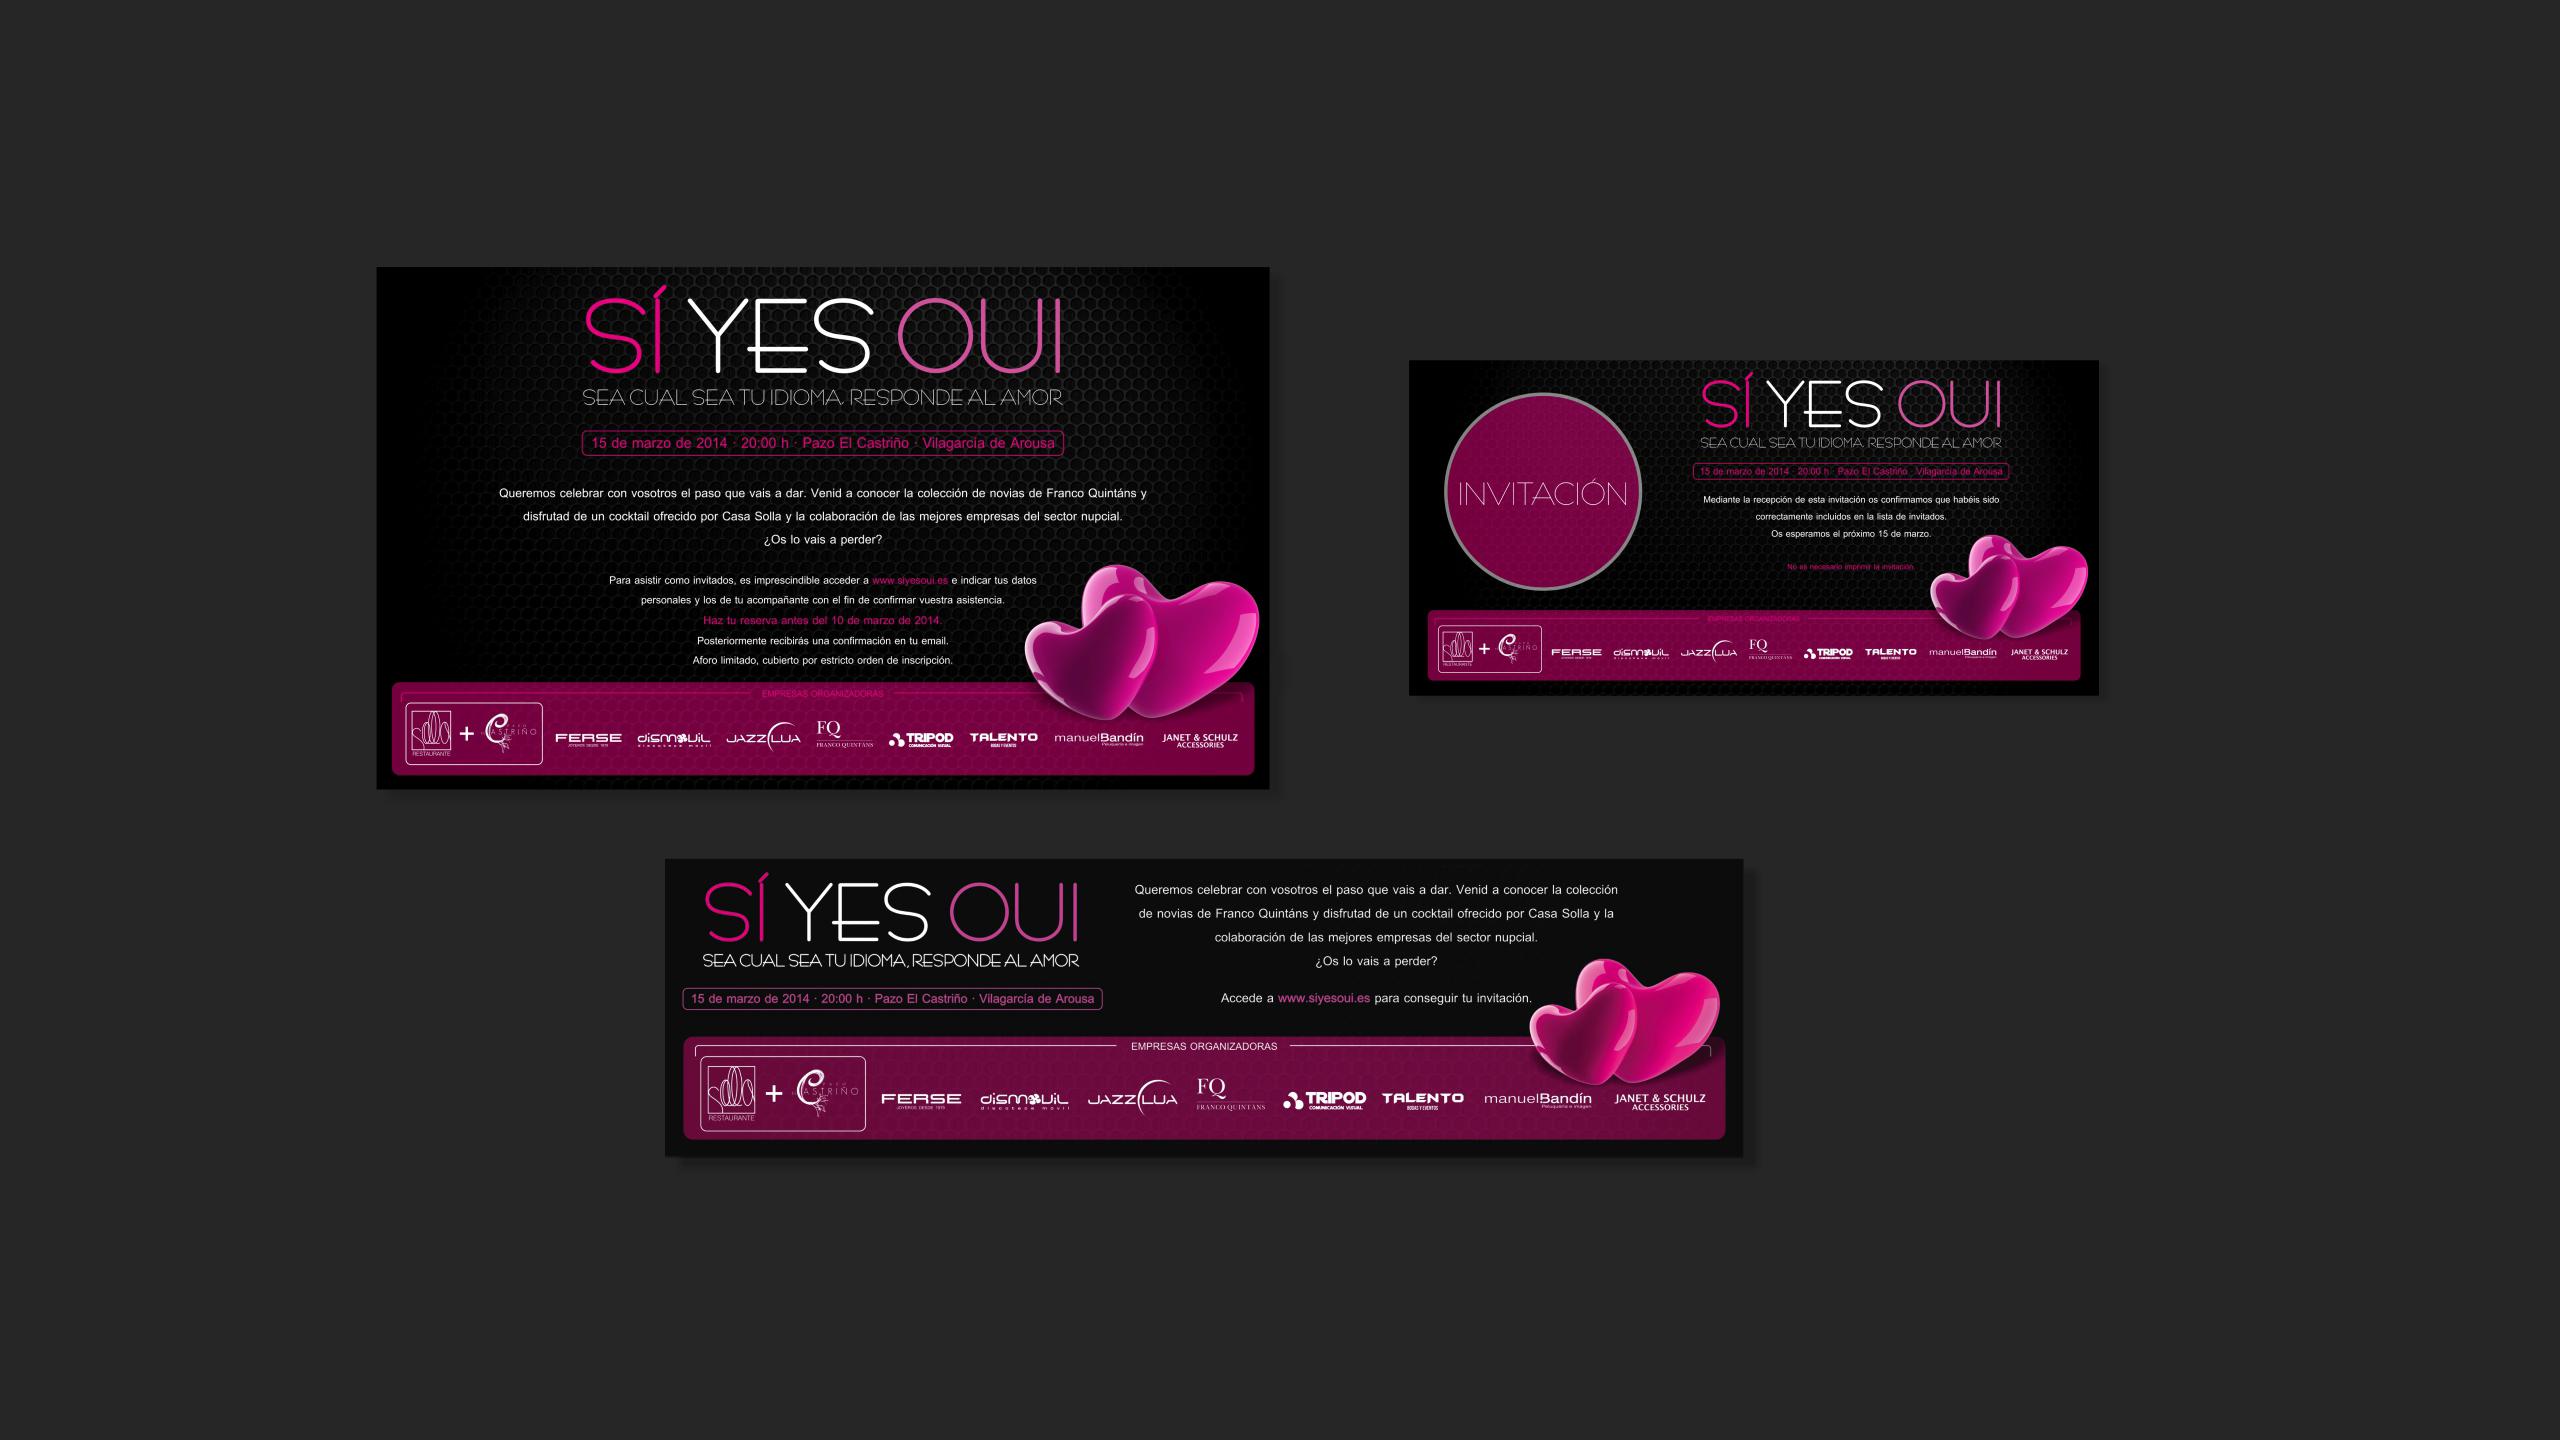 Diseño Siyesoui diseño material promocional